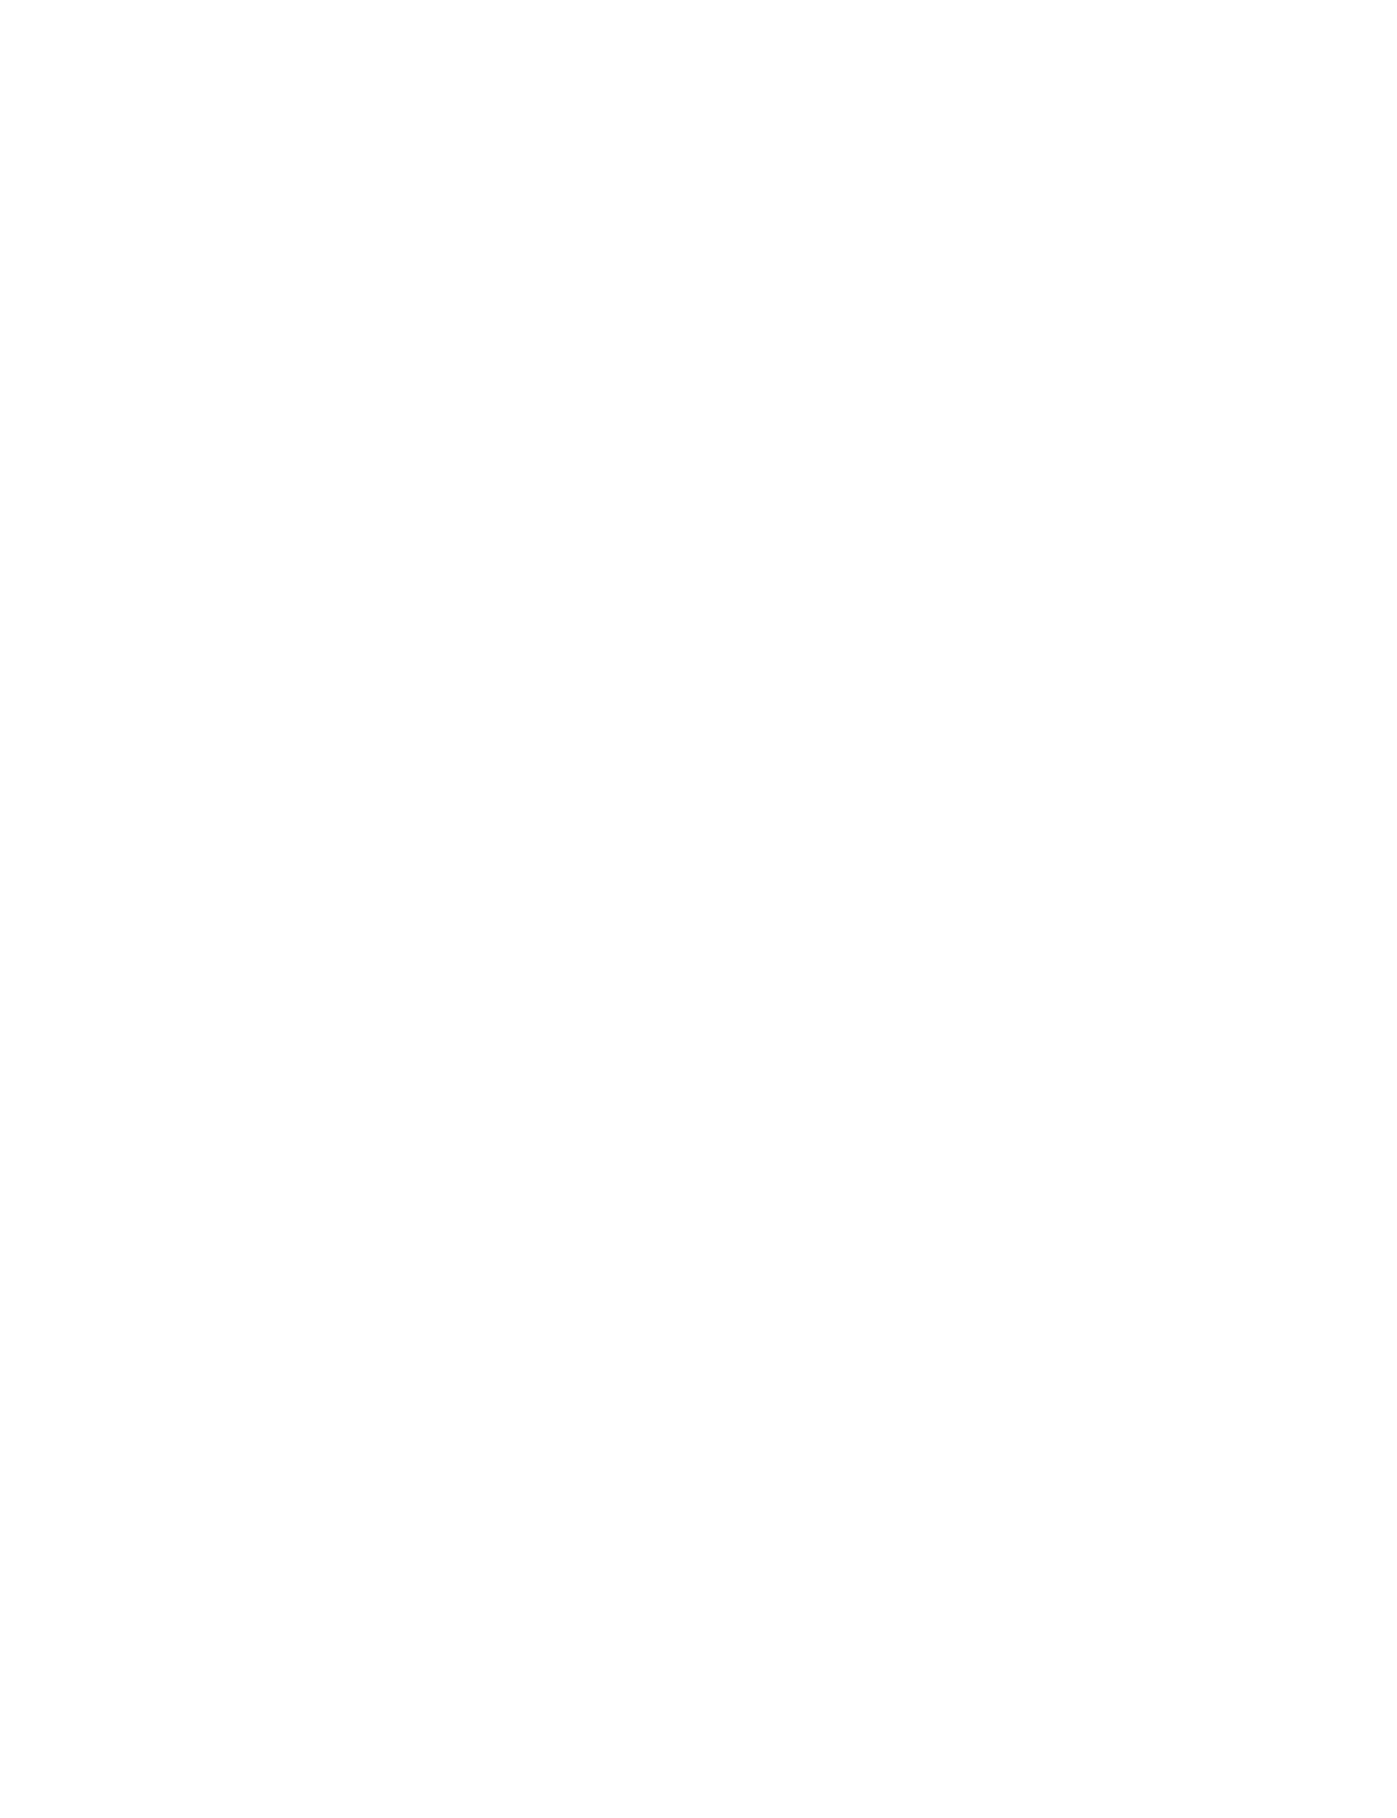 MxHpics logo white